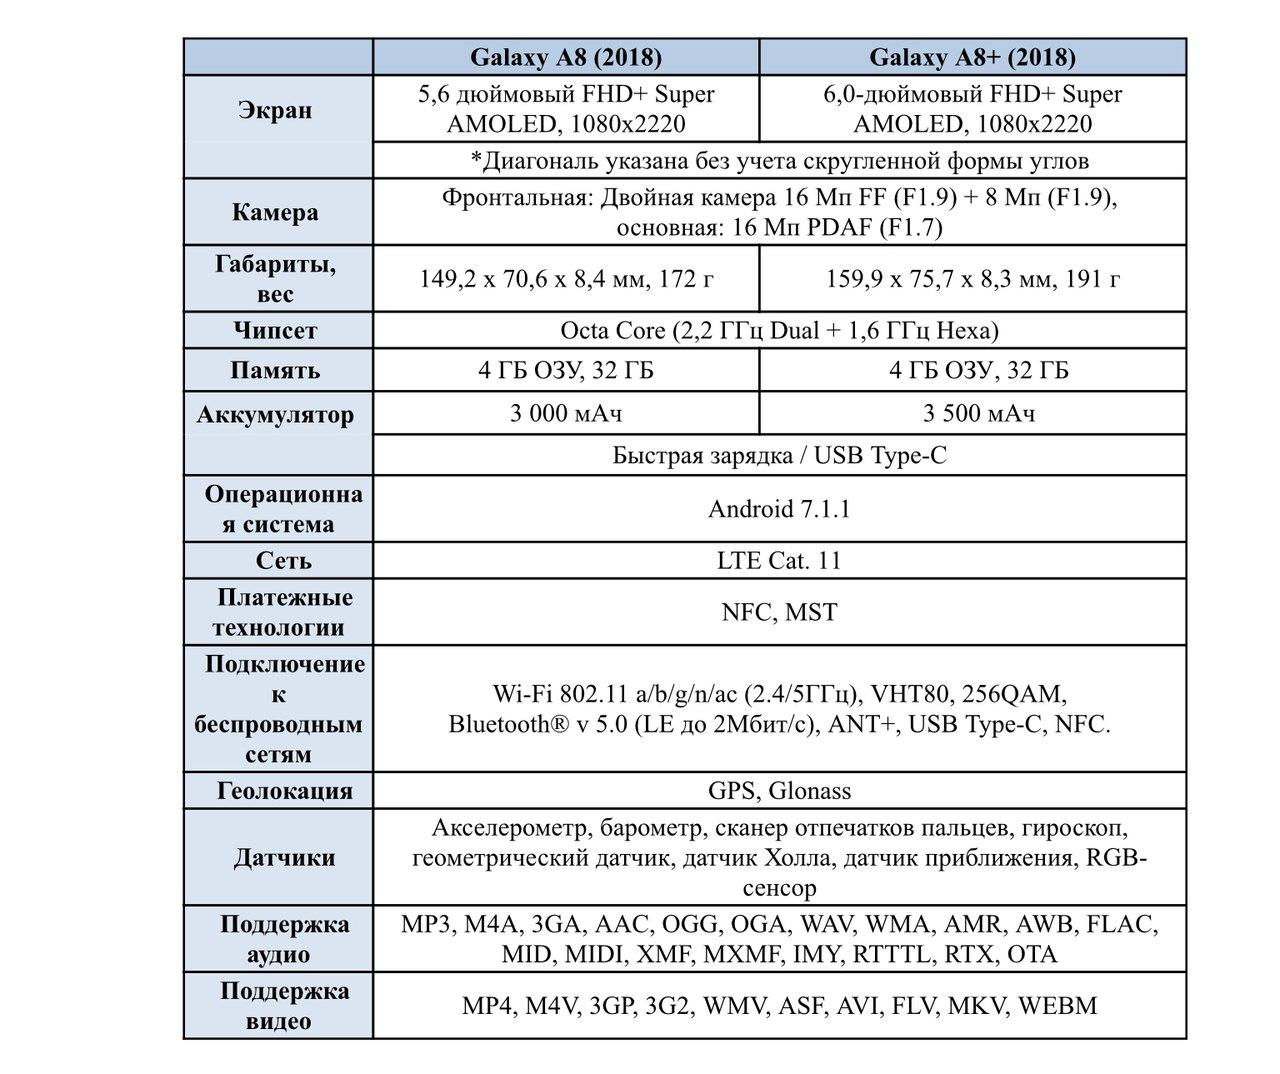 Фото ихарактеристики бюджетного Самсунг Galaxy J2 (2018)— Утечка